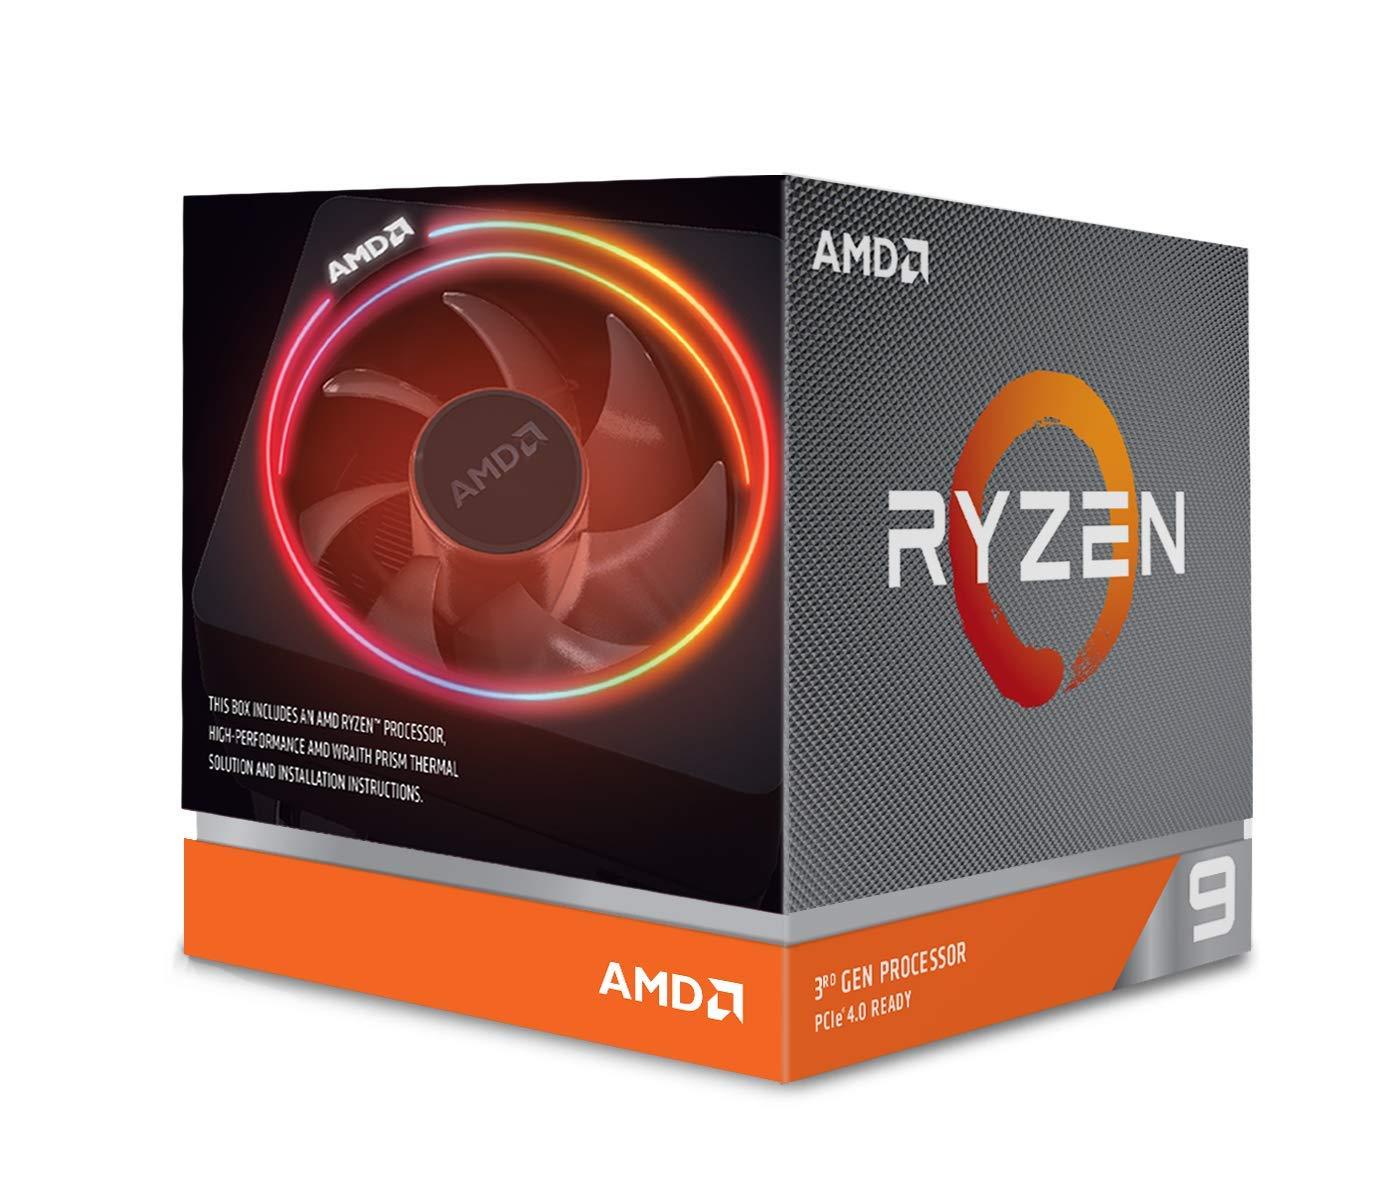 AMD Ryzen 9 3900X Processor (12C/24T, 70MB Cache, 4.6 GHz Max Boost) - £479.99 @ Amazon